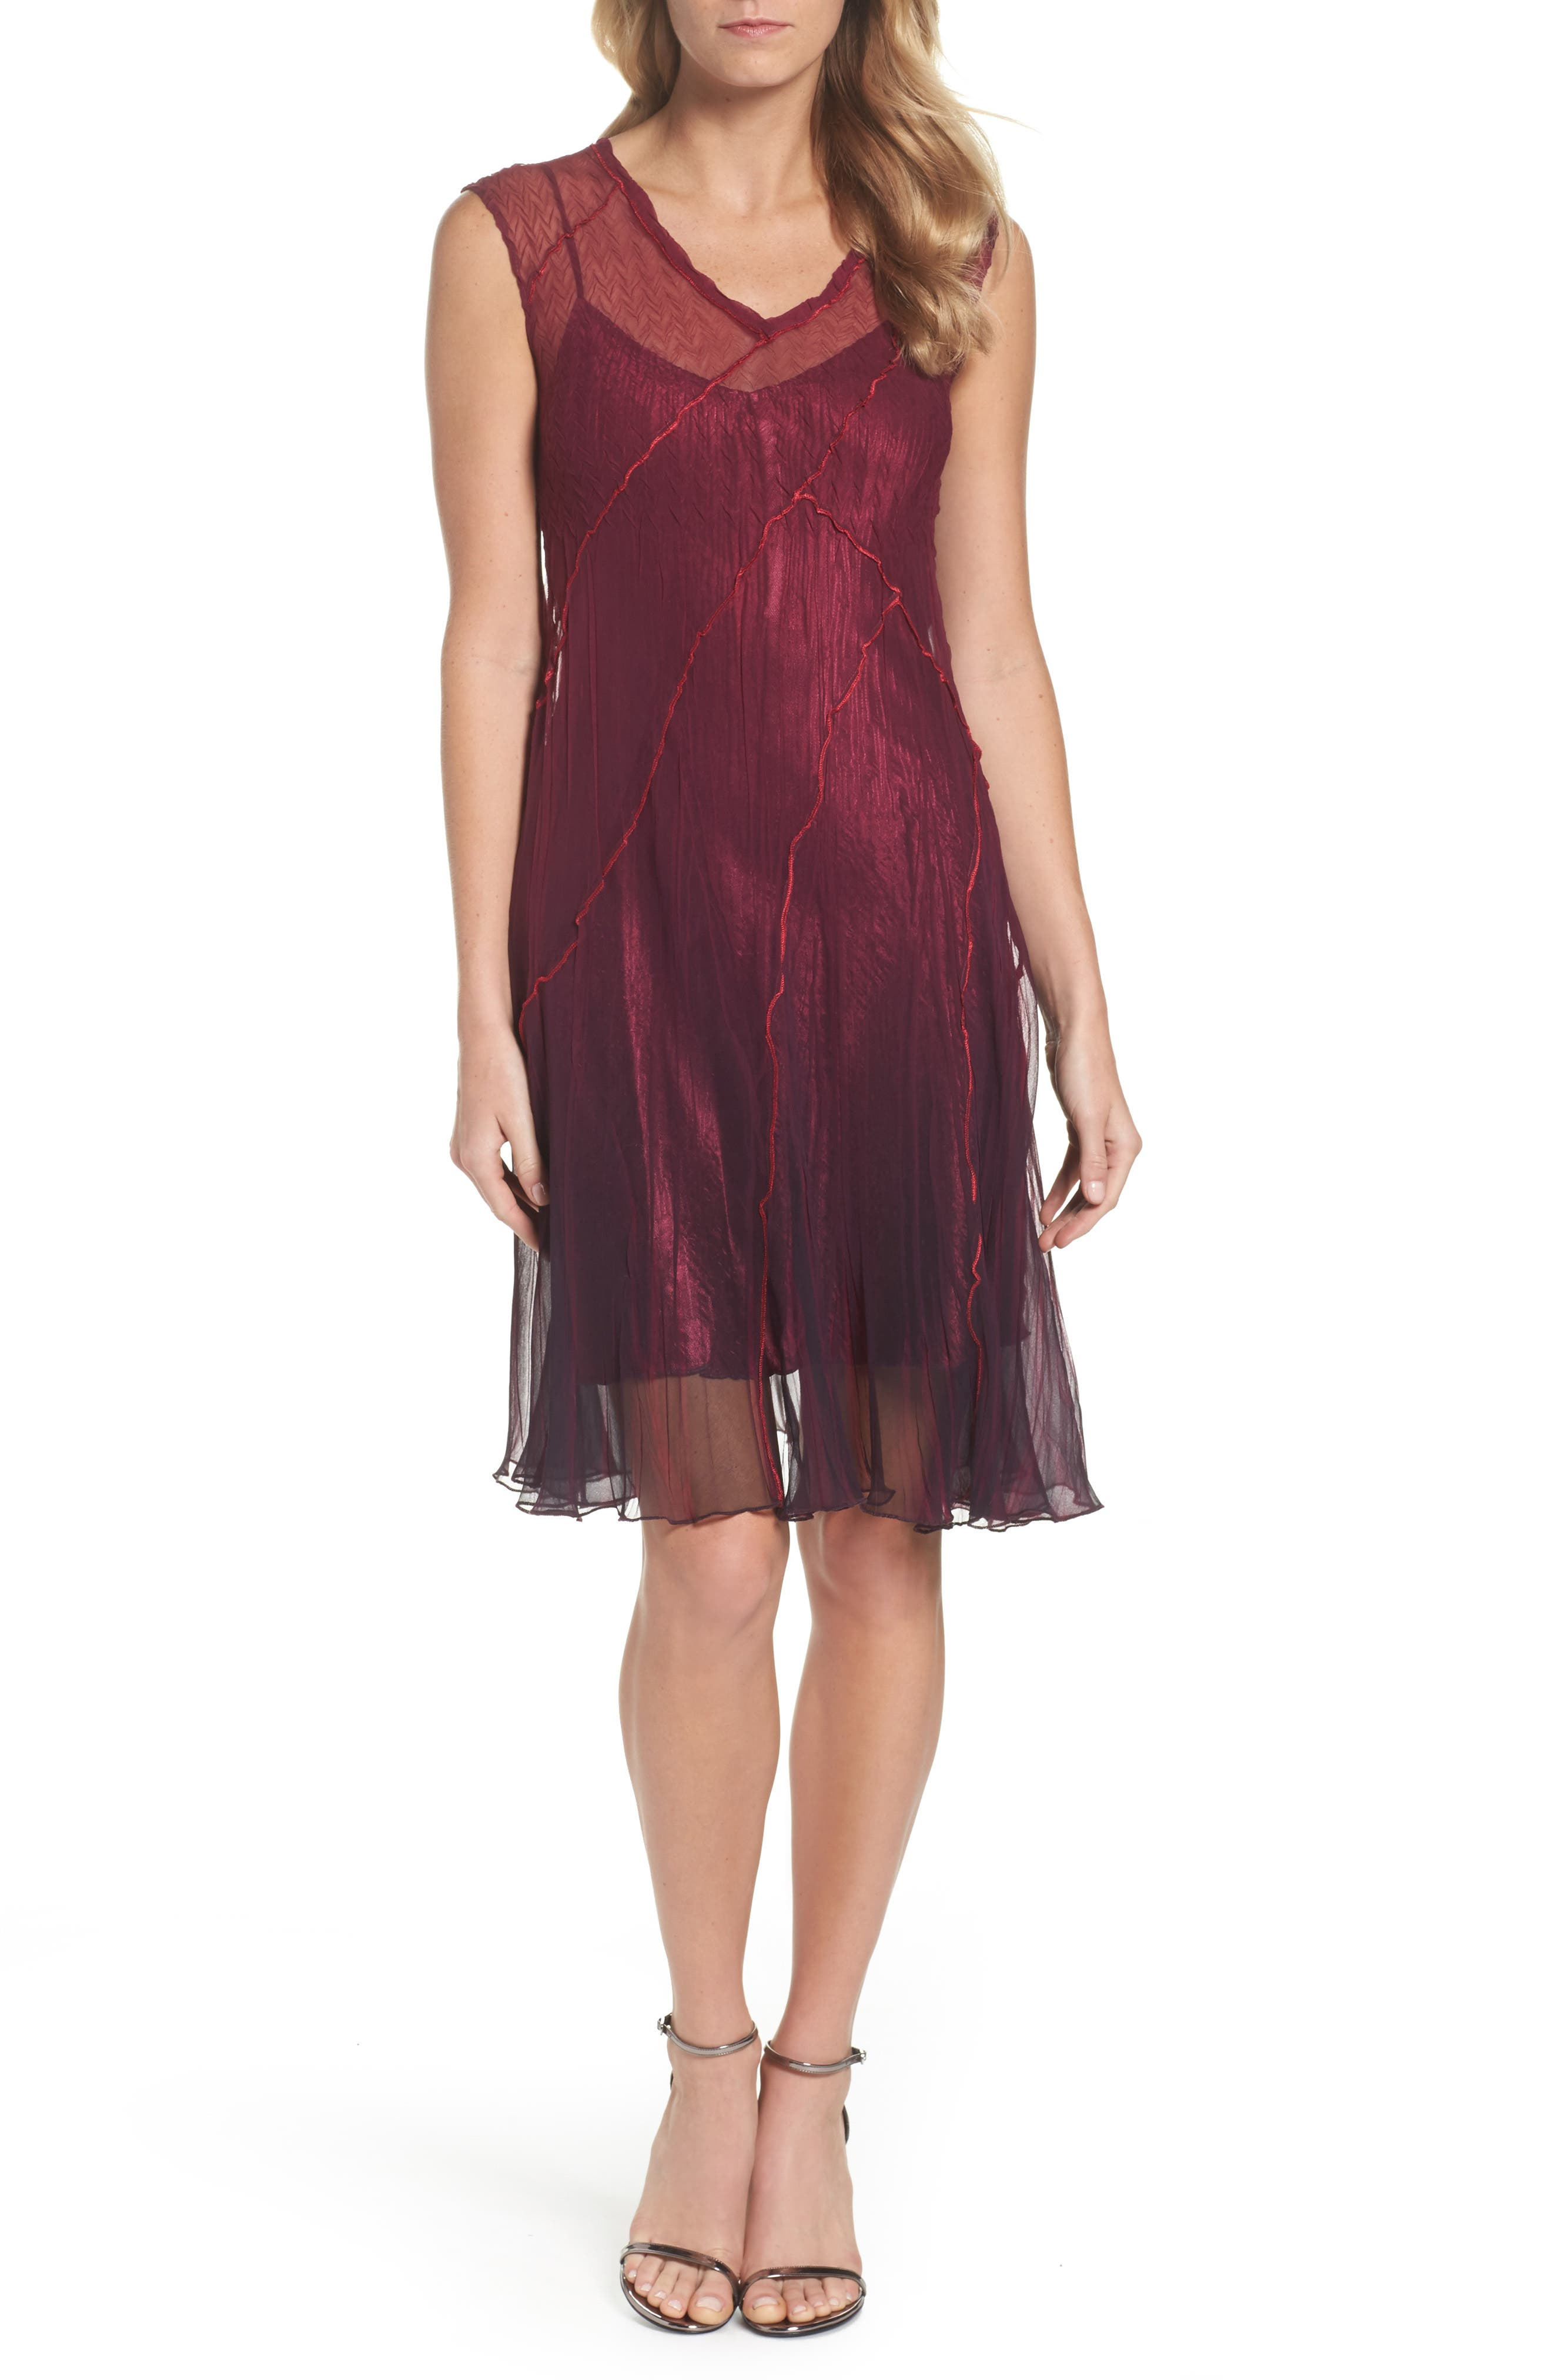 Chiffon A-Line Dress,                             Main thumbnail 1, color,                             Red Plum Blue Ombre